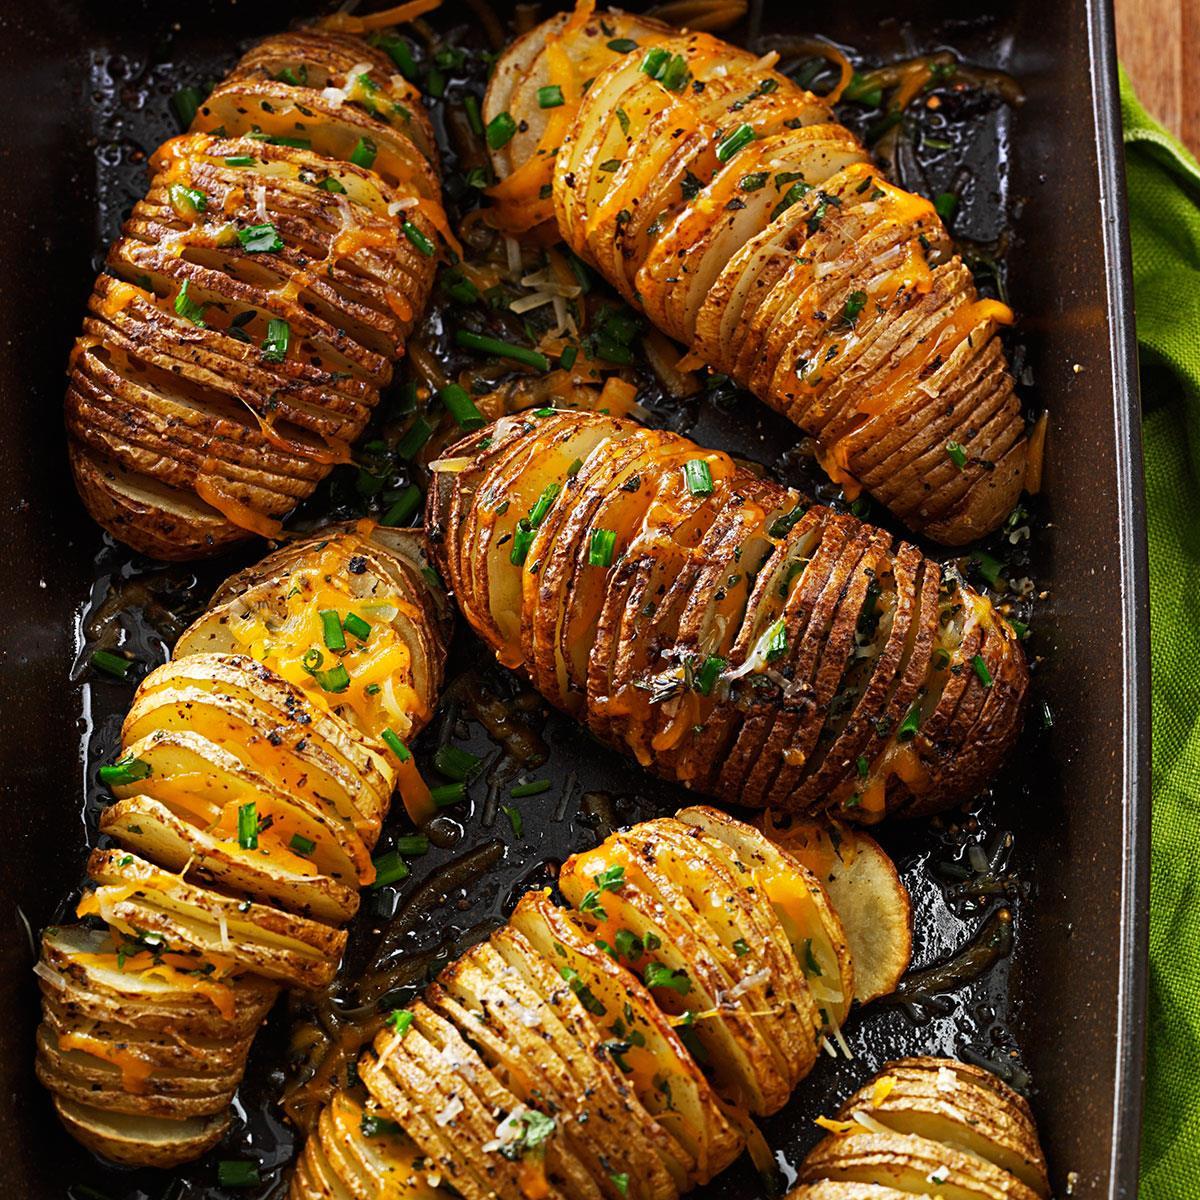 How to Make Potato Spirals